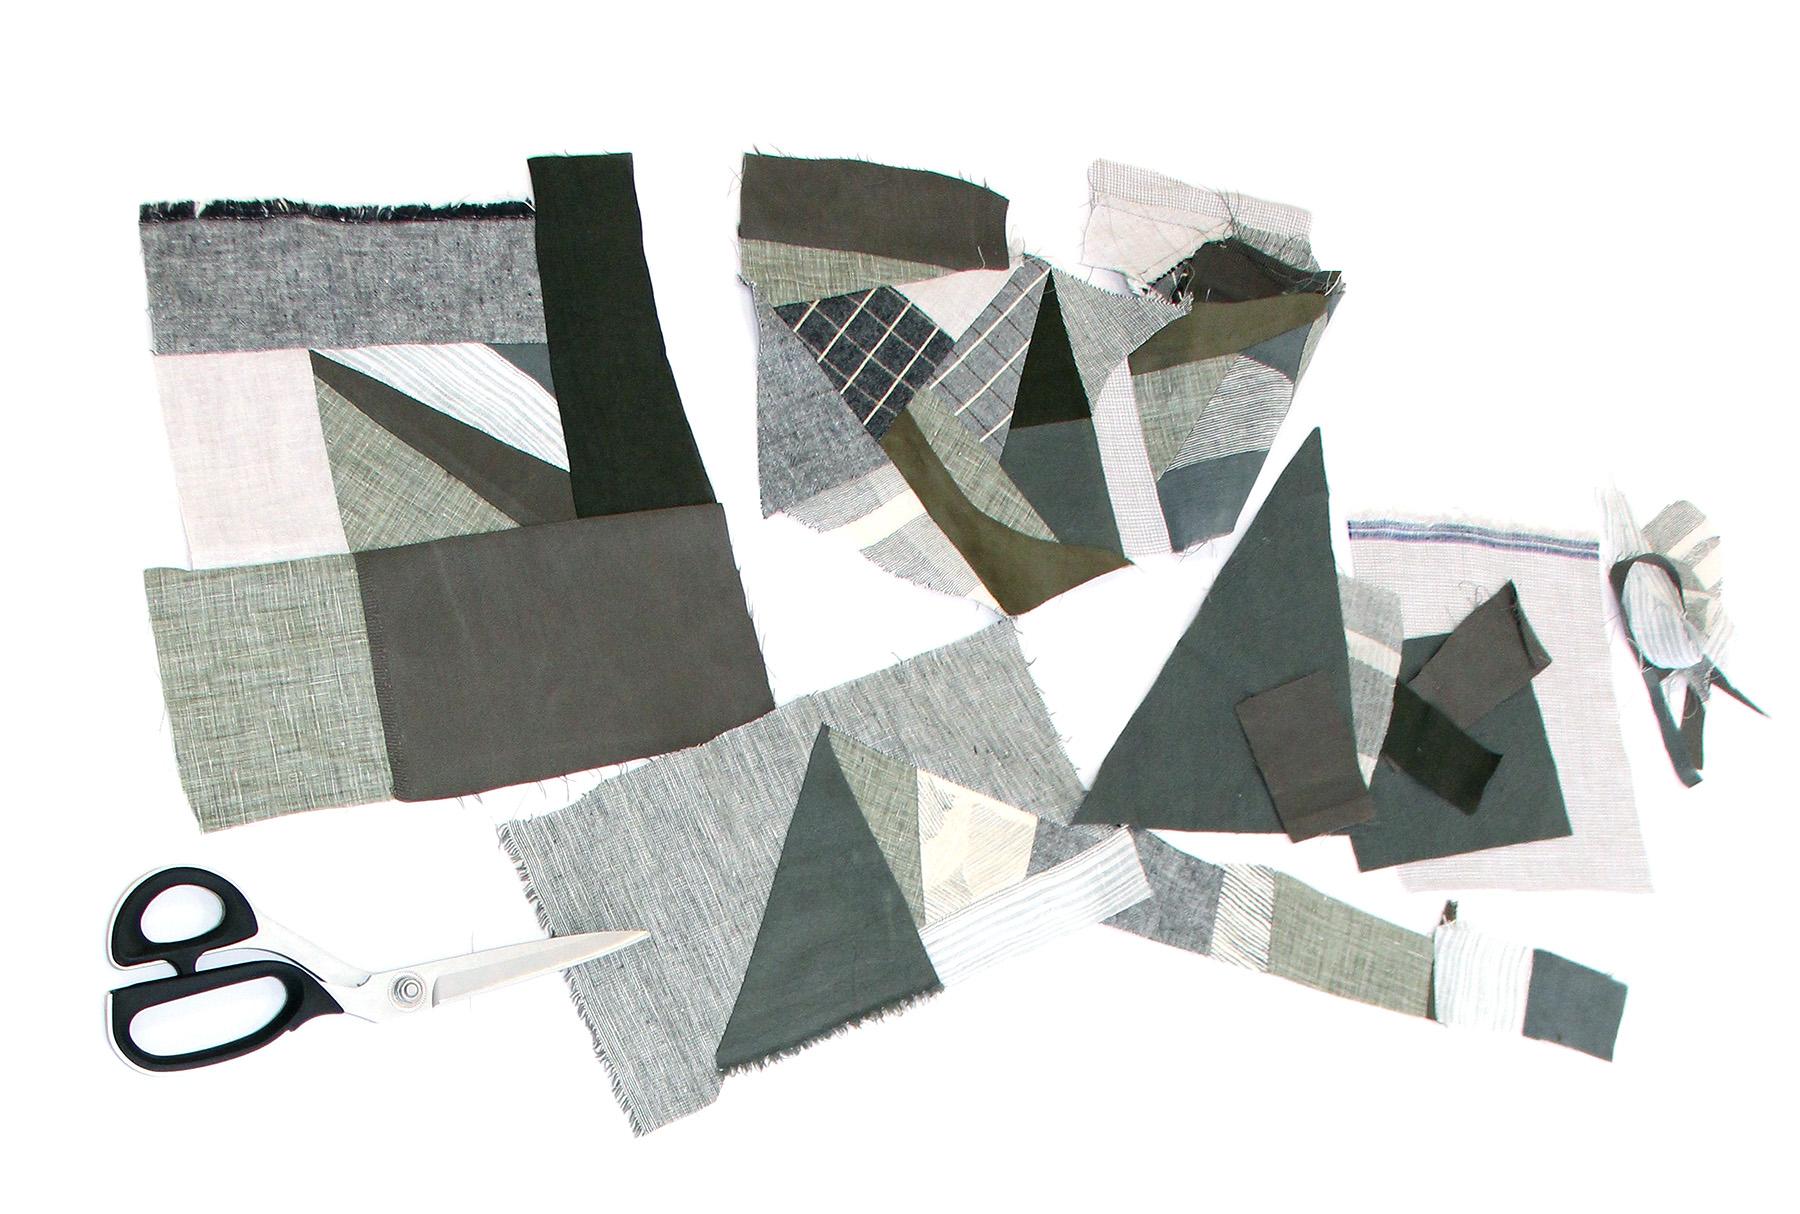 Megan Nielsen Patterns | Hovea Sewalong: Scrap Quilting | Finding Pieces That Fit Together & Building Blocks